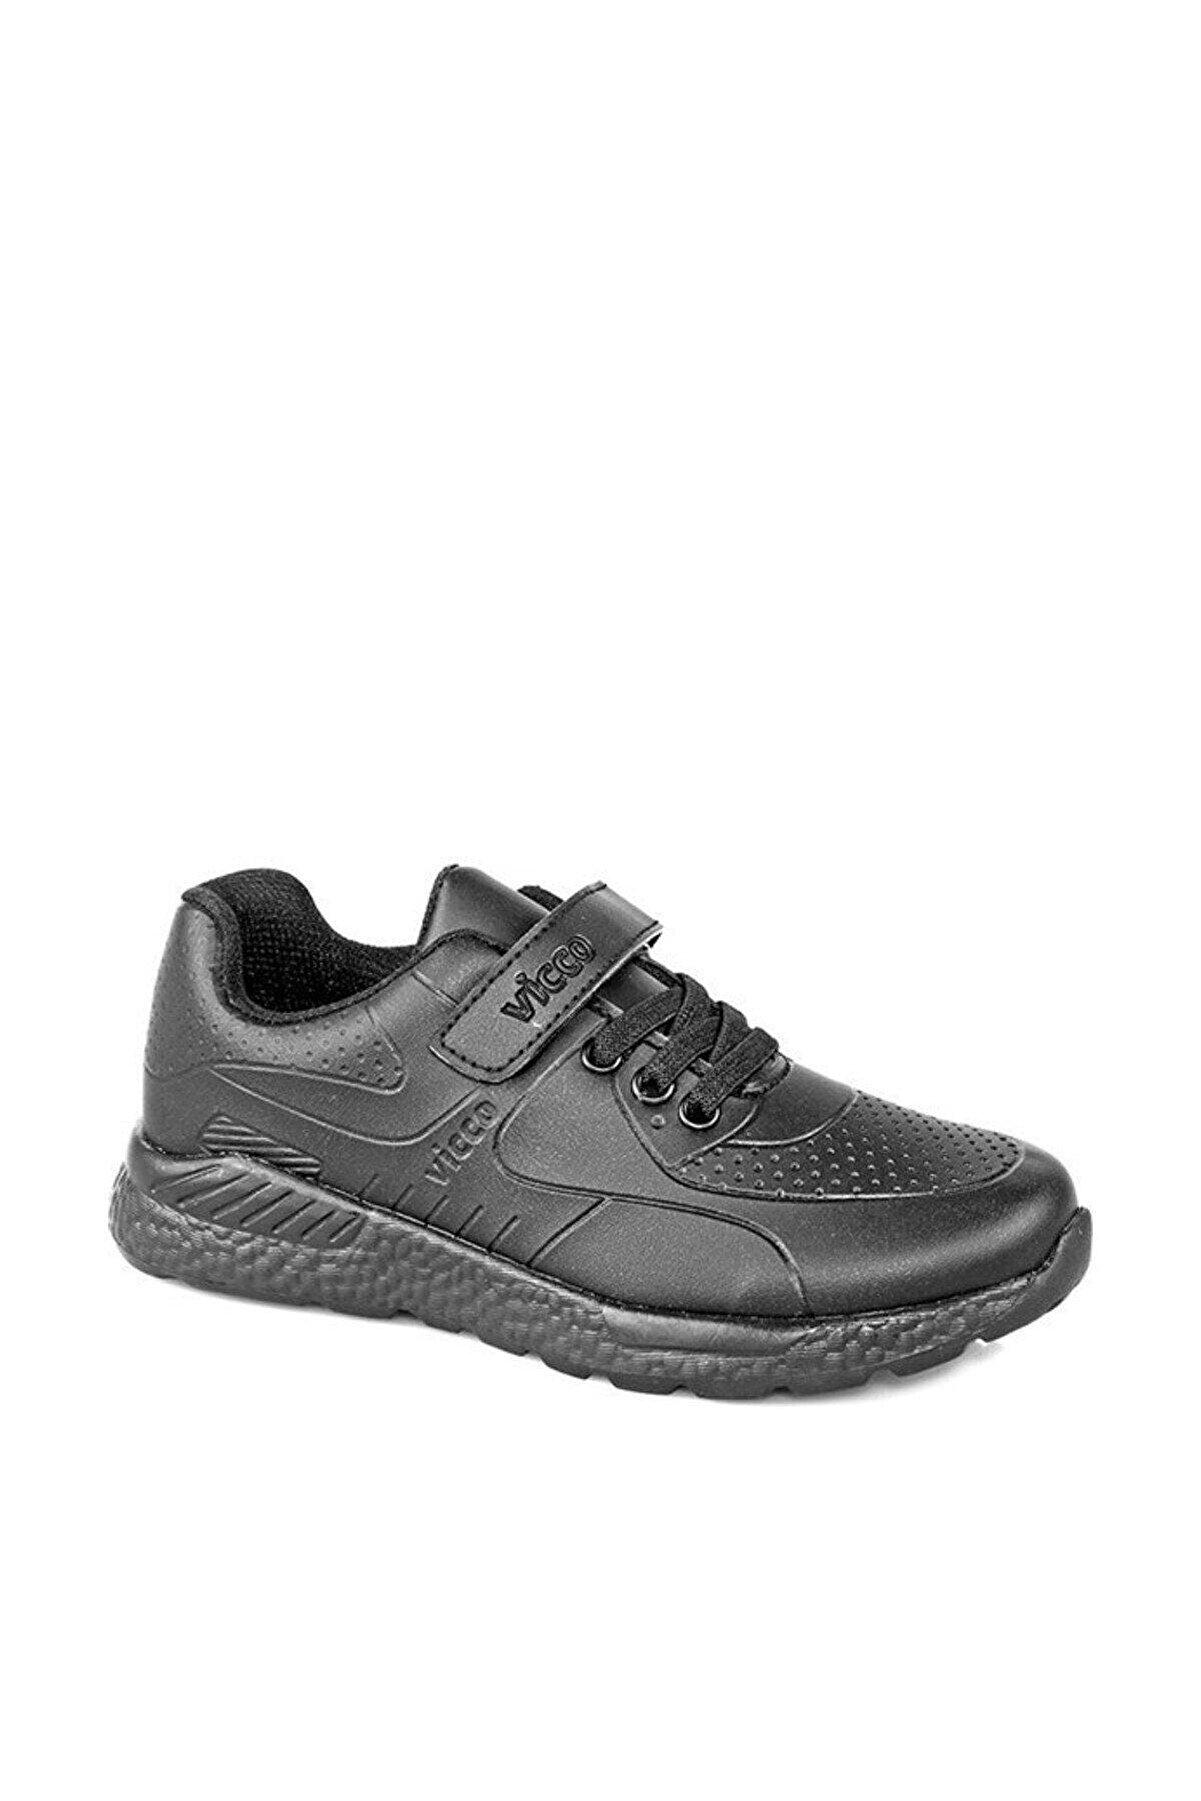 Vicco Phylon Siyah Ayakkabı